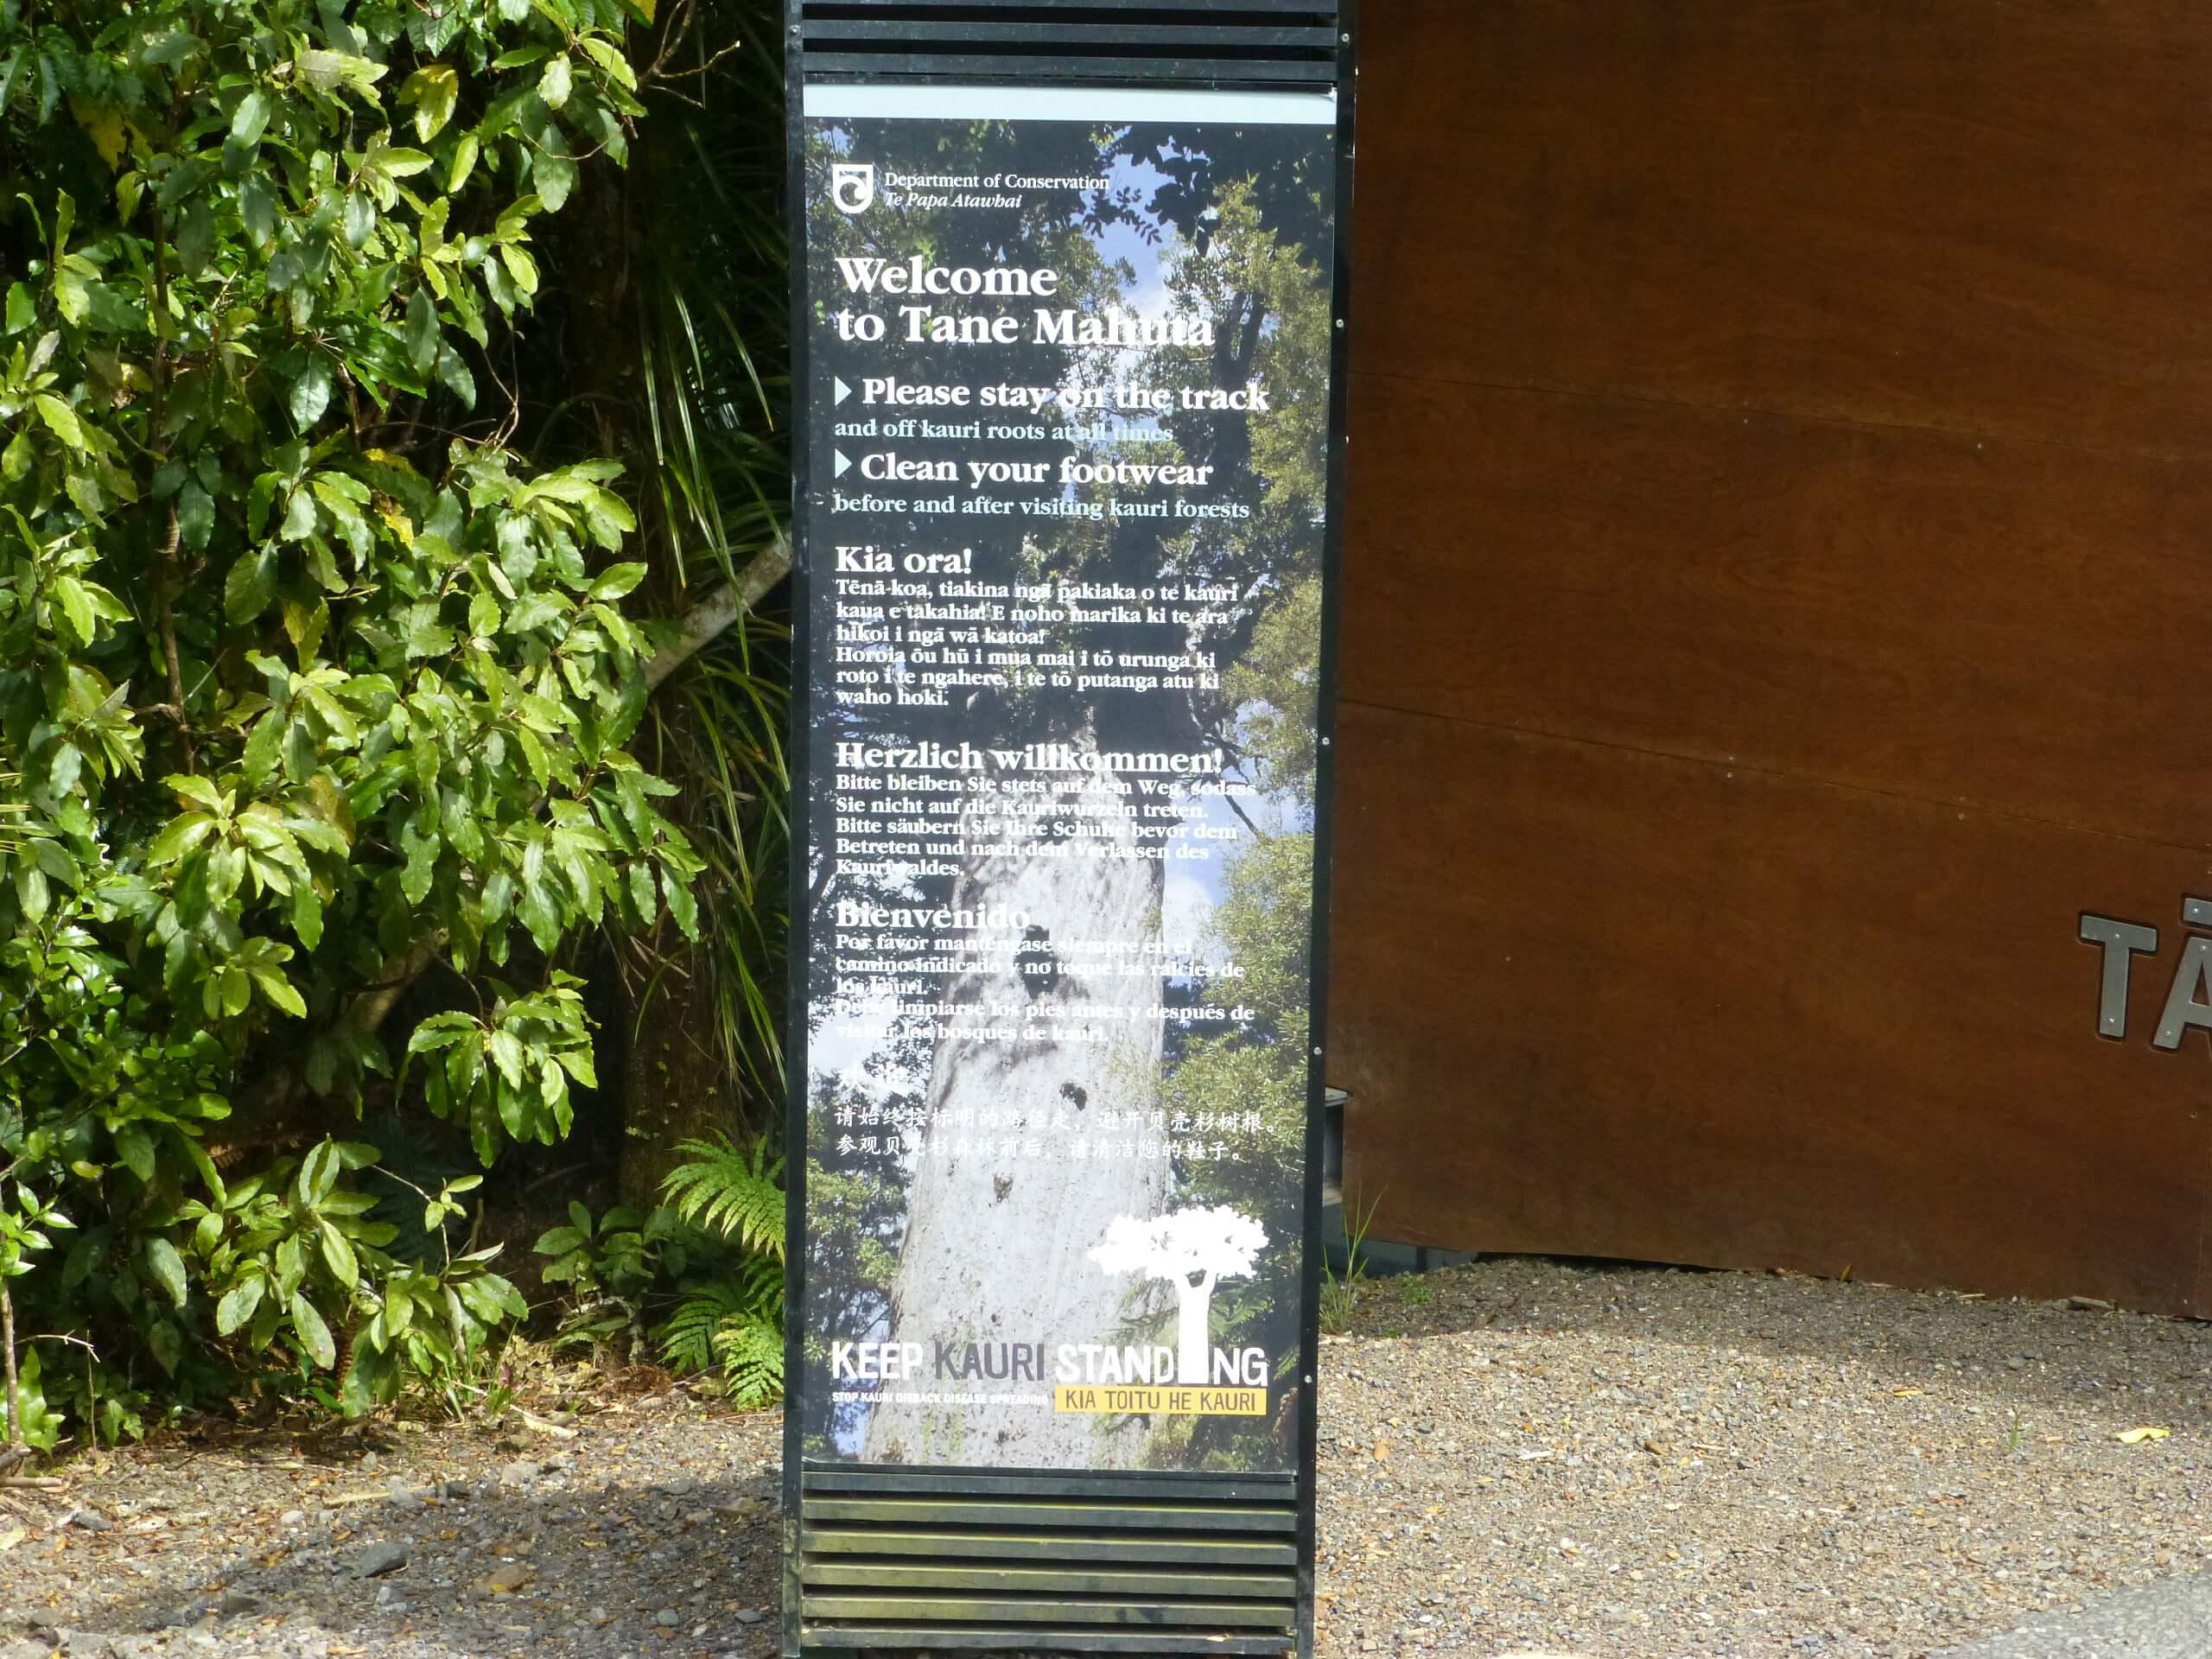 weit weg reisen, Waipoua Forest, Tane Mahuta 4